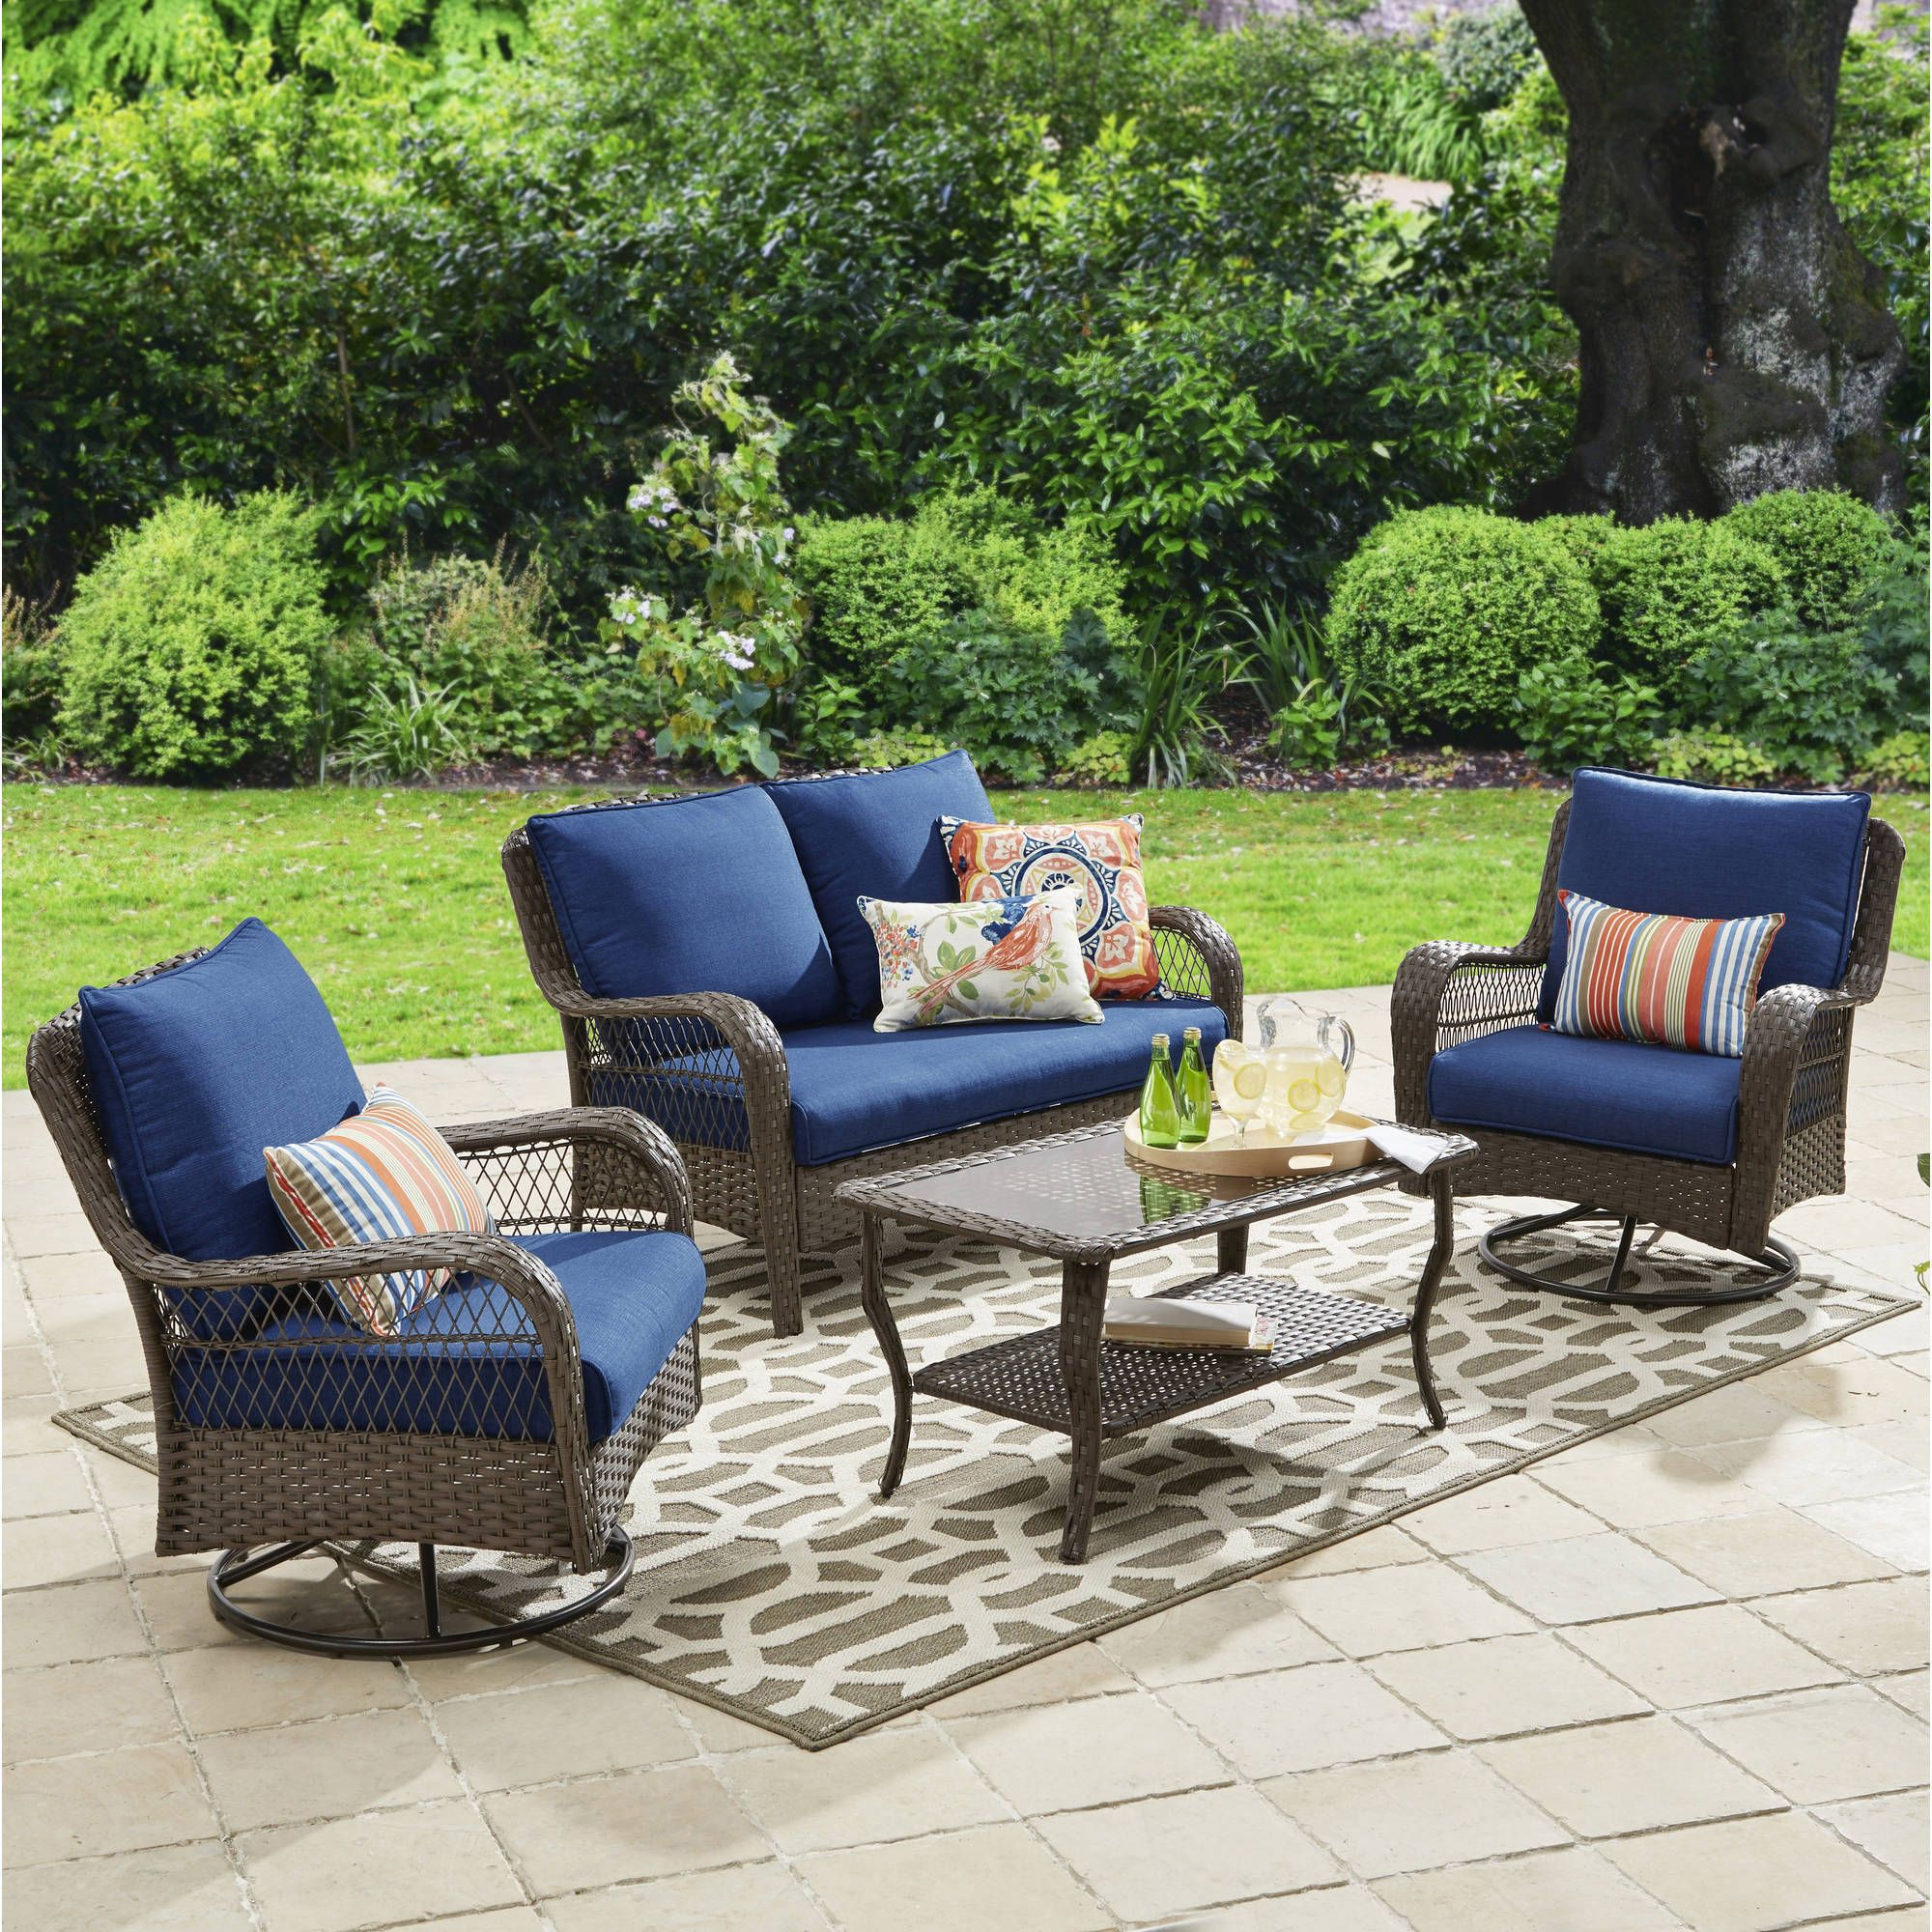 Buy Better Homes and Gardens Colebrook 4-Piece Outdoor Conversation ...